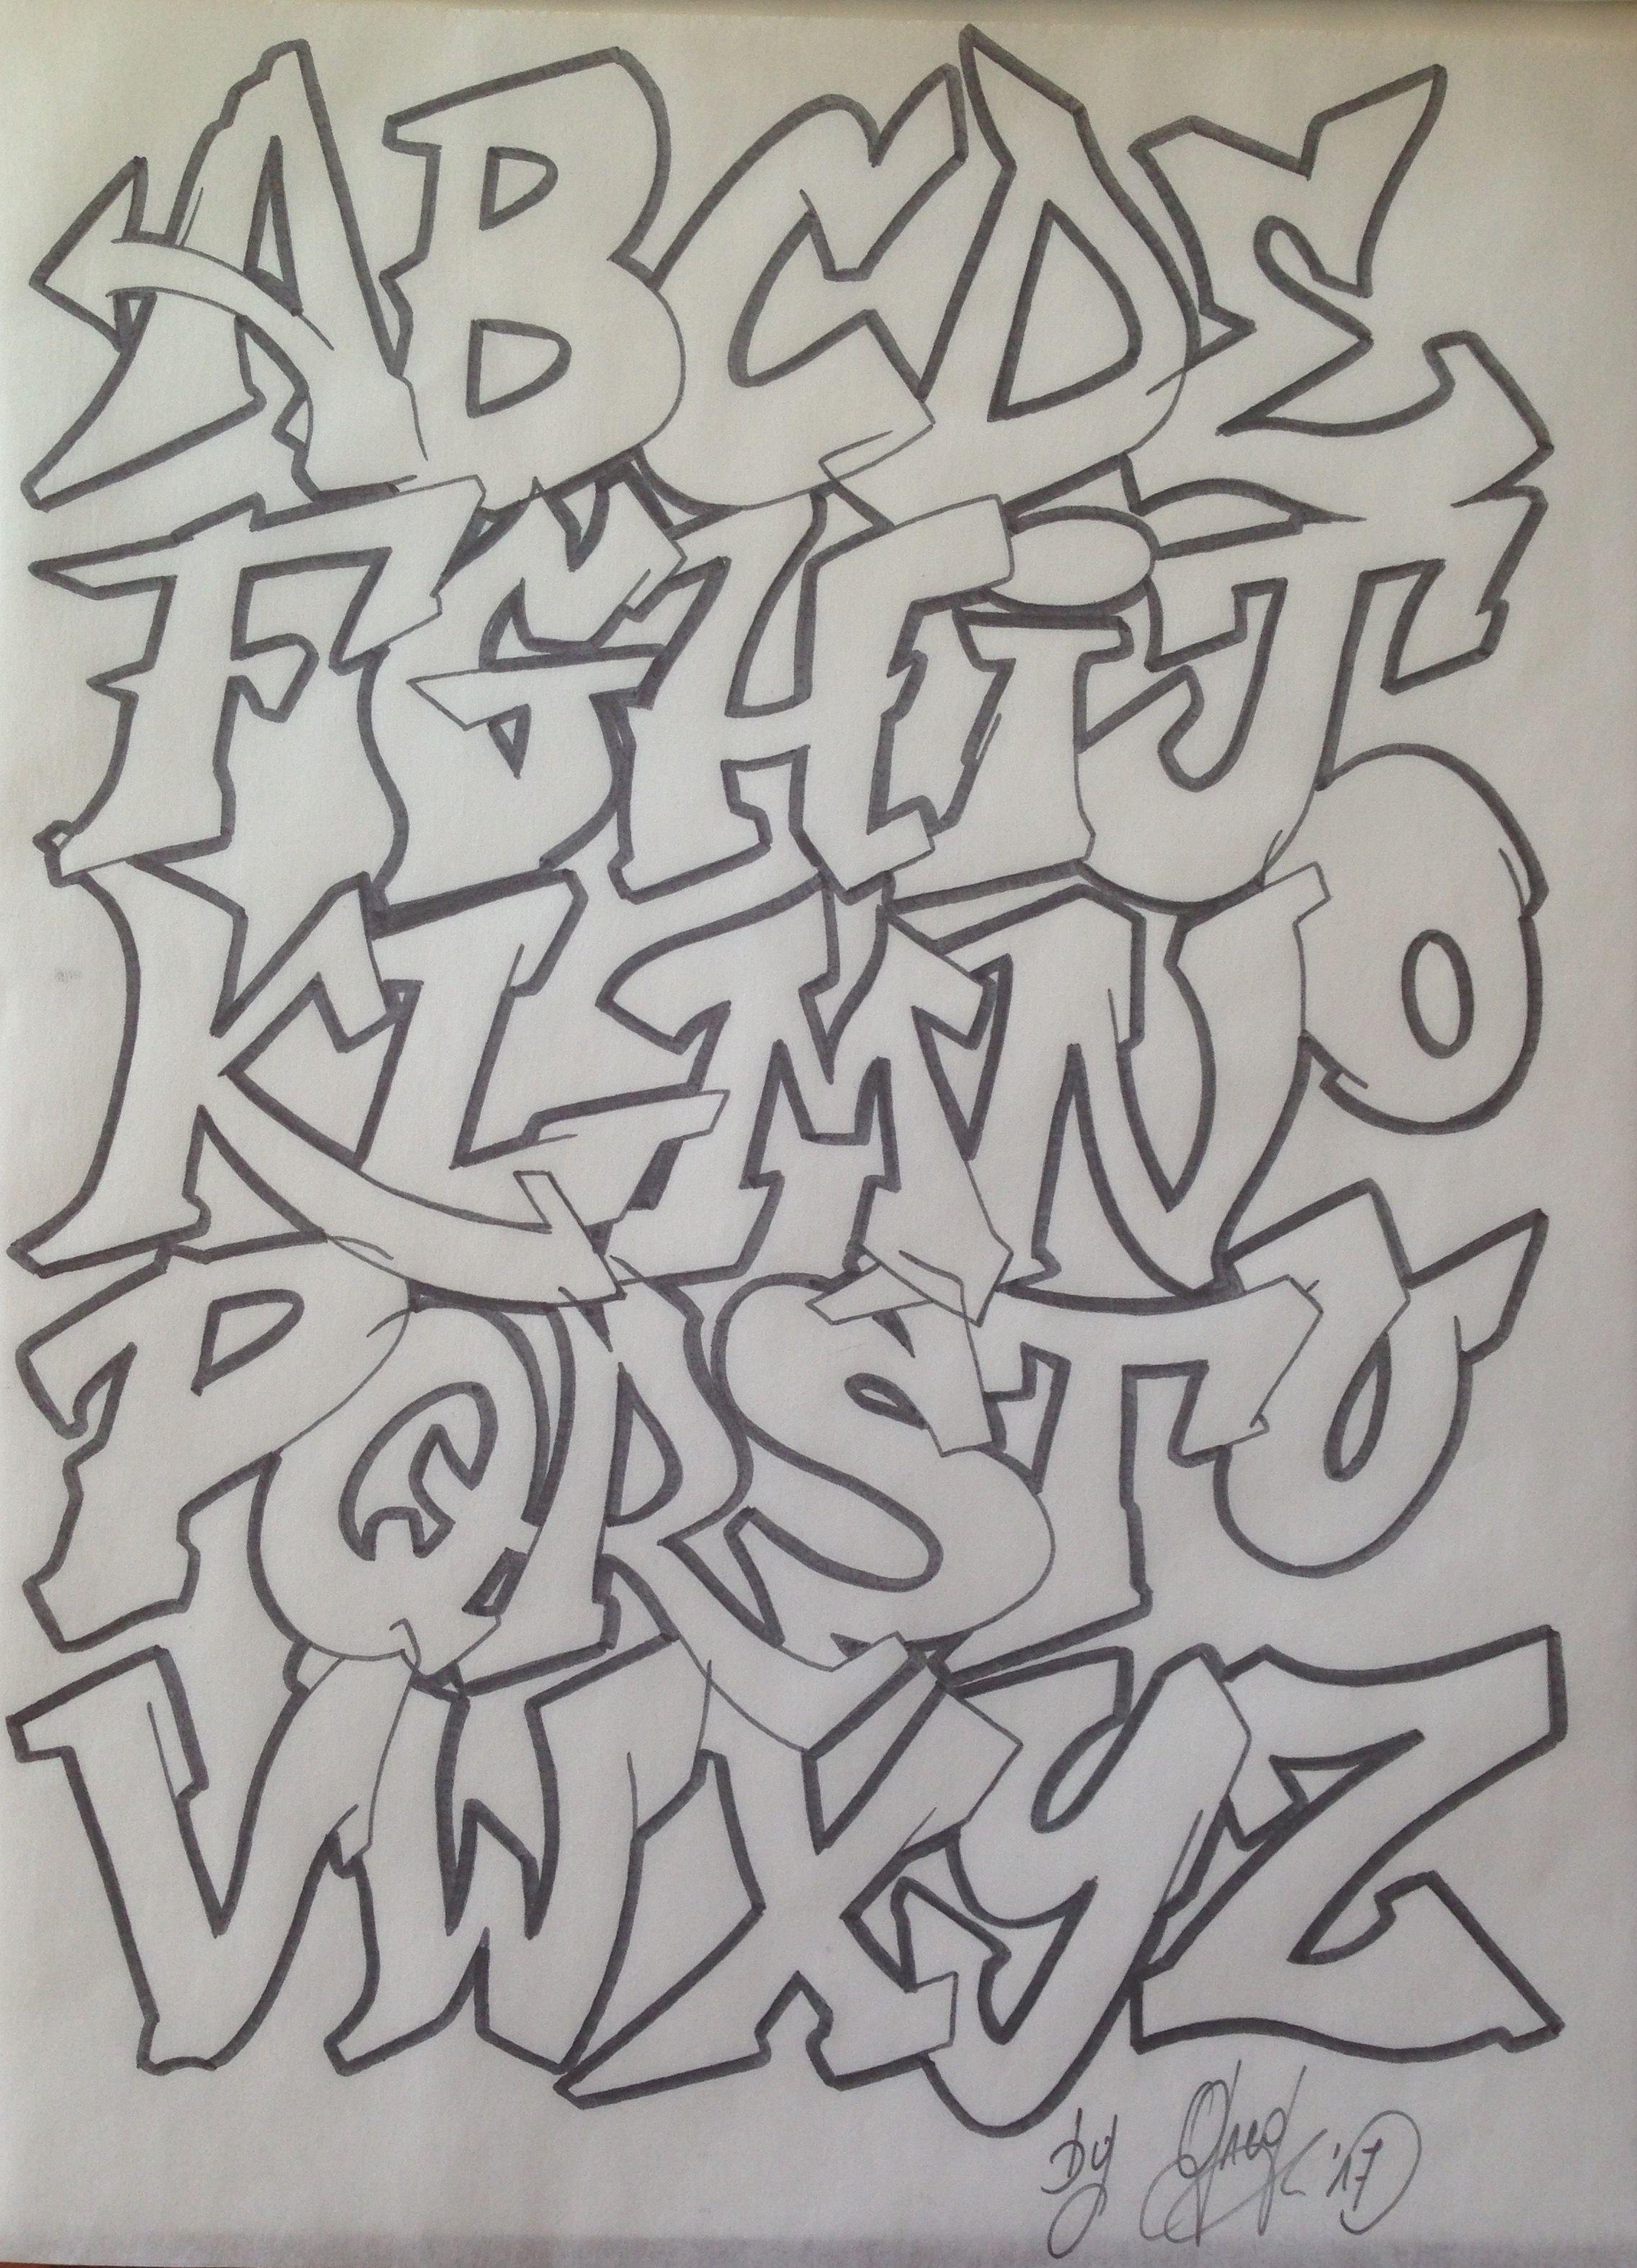 Graff Graffiti Tag Street Art Lettering Alphabet Tipos